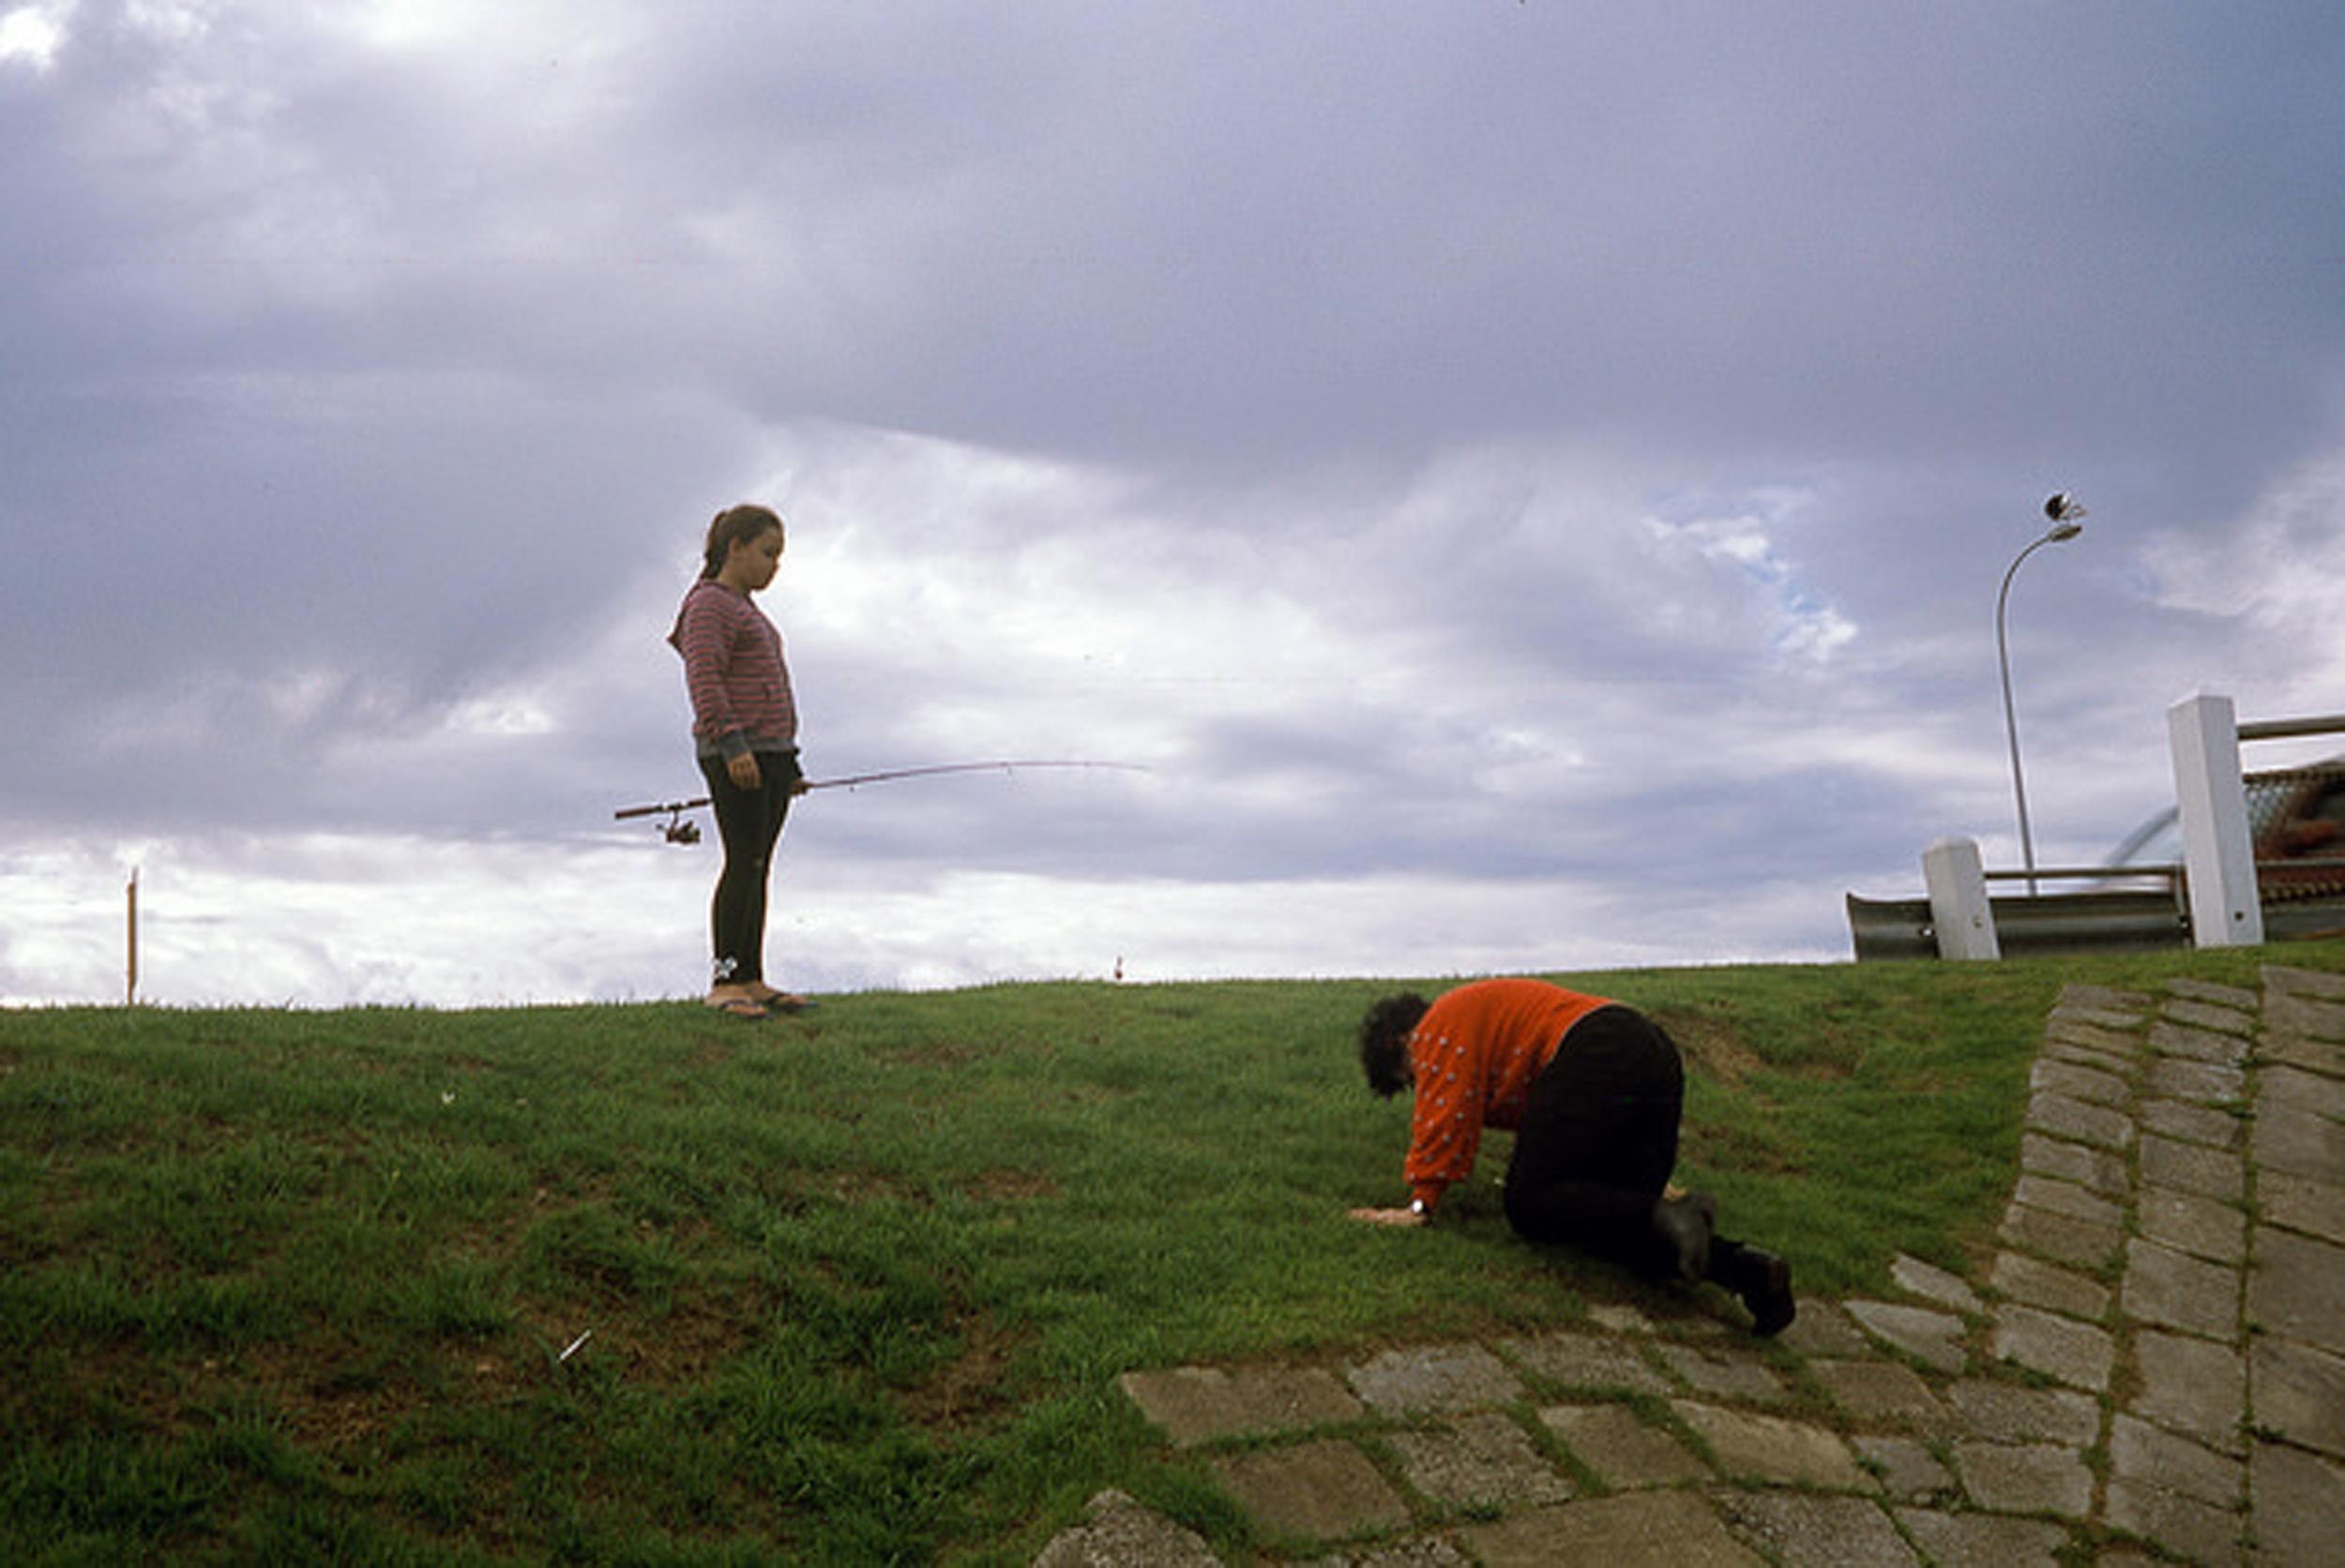 justin_tan_torres_australian_street_photography_fishing_bowing_grassy_hill_suburbia_perth_2014_08.jpg